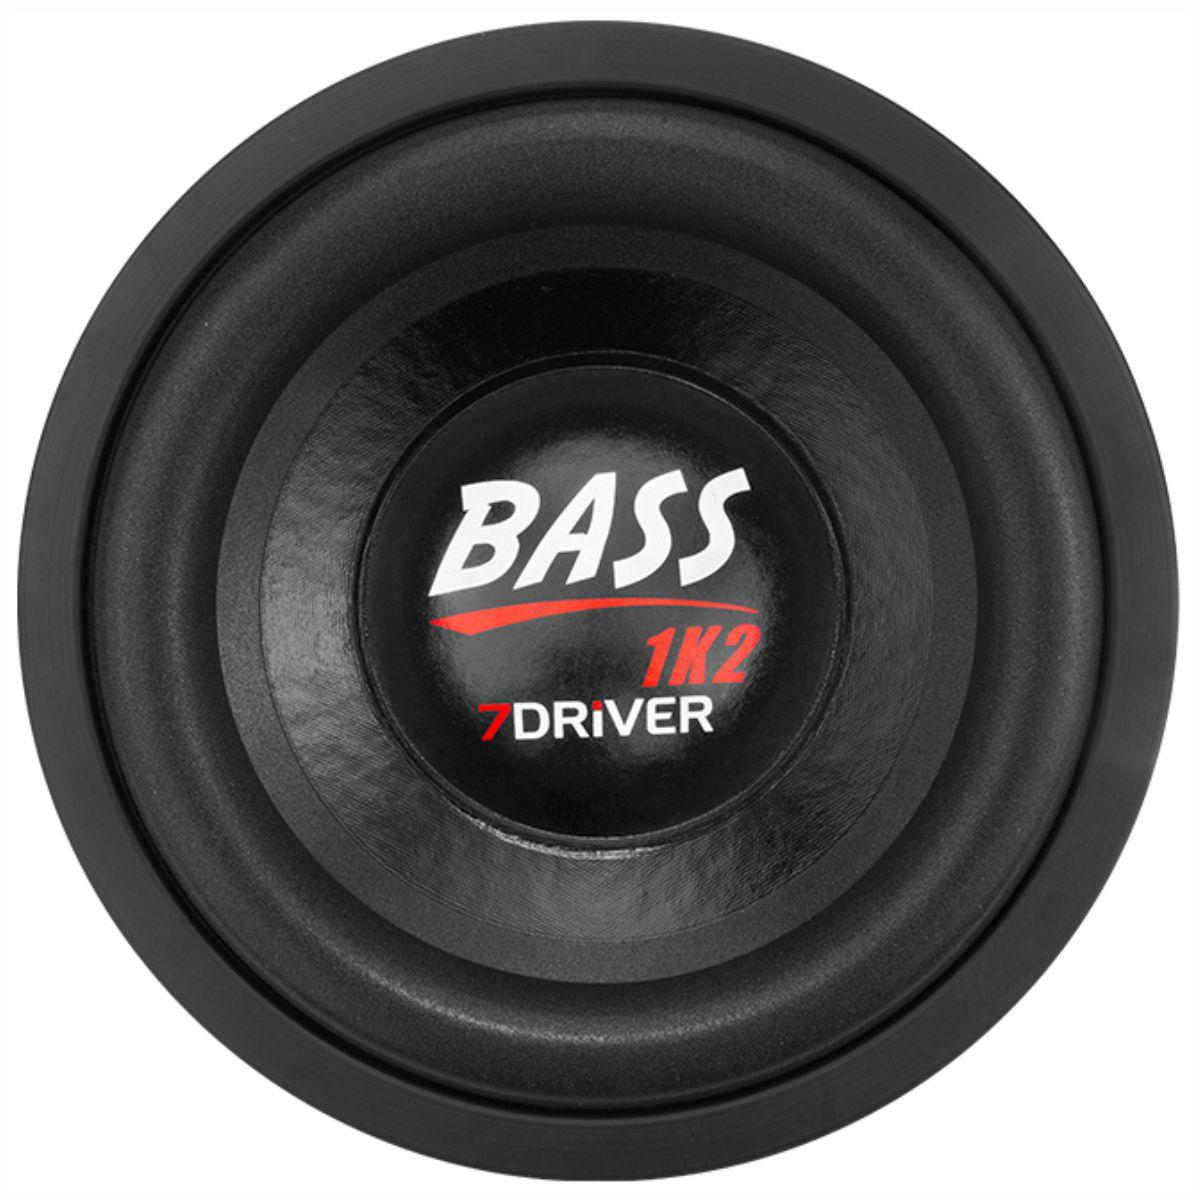 "Alto Falante Subwoofer 7Driver 10"" Bass 1K2 600W RMS 4+4 Ohms"